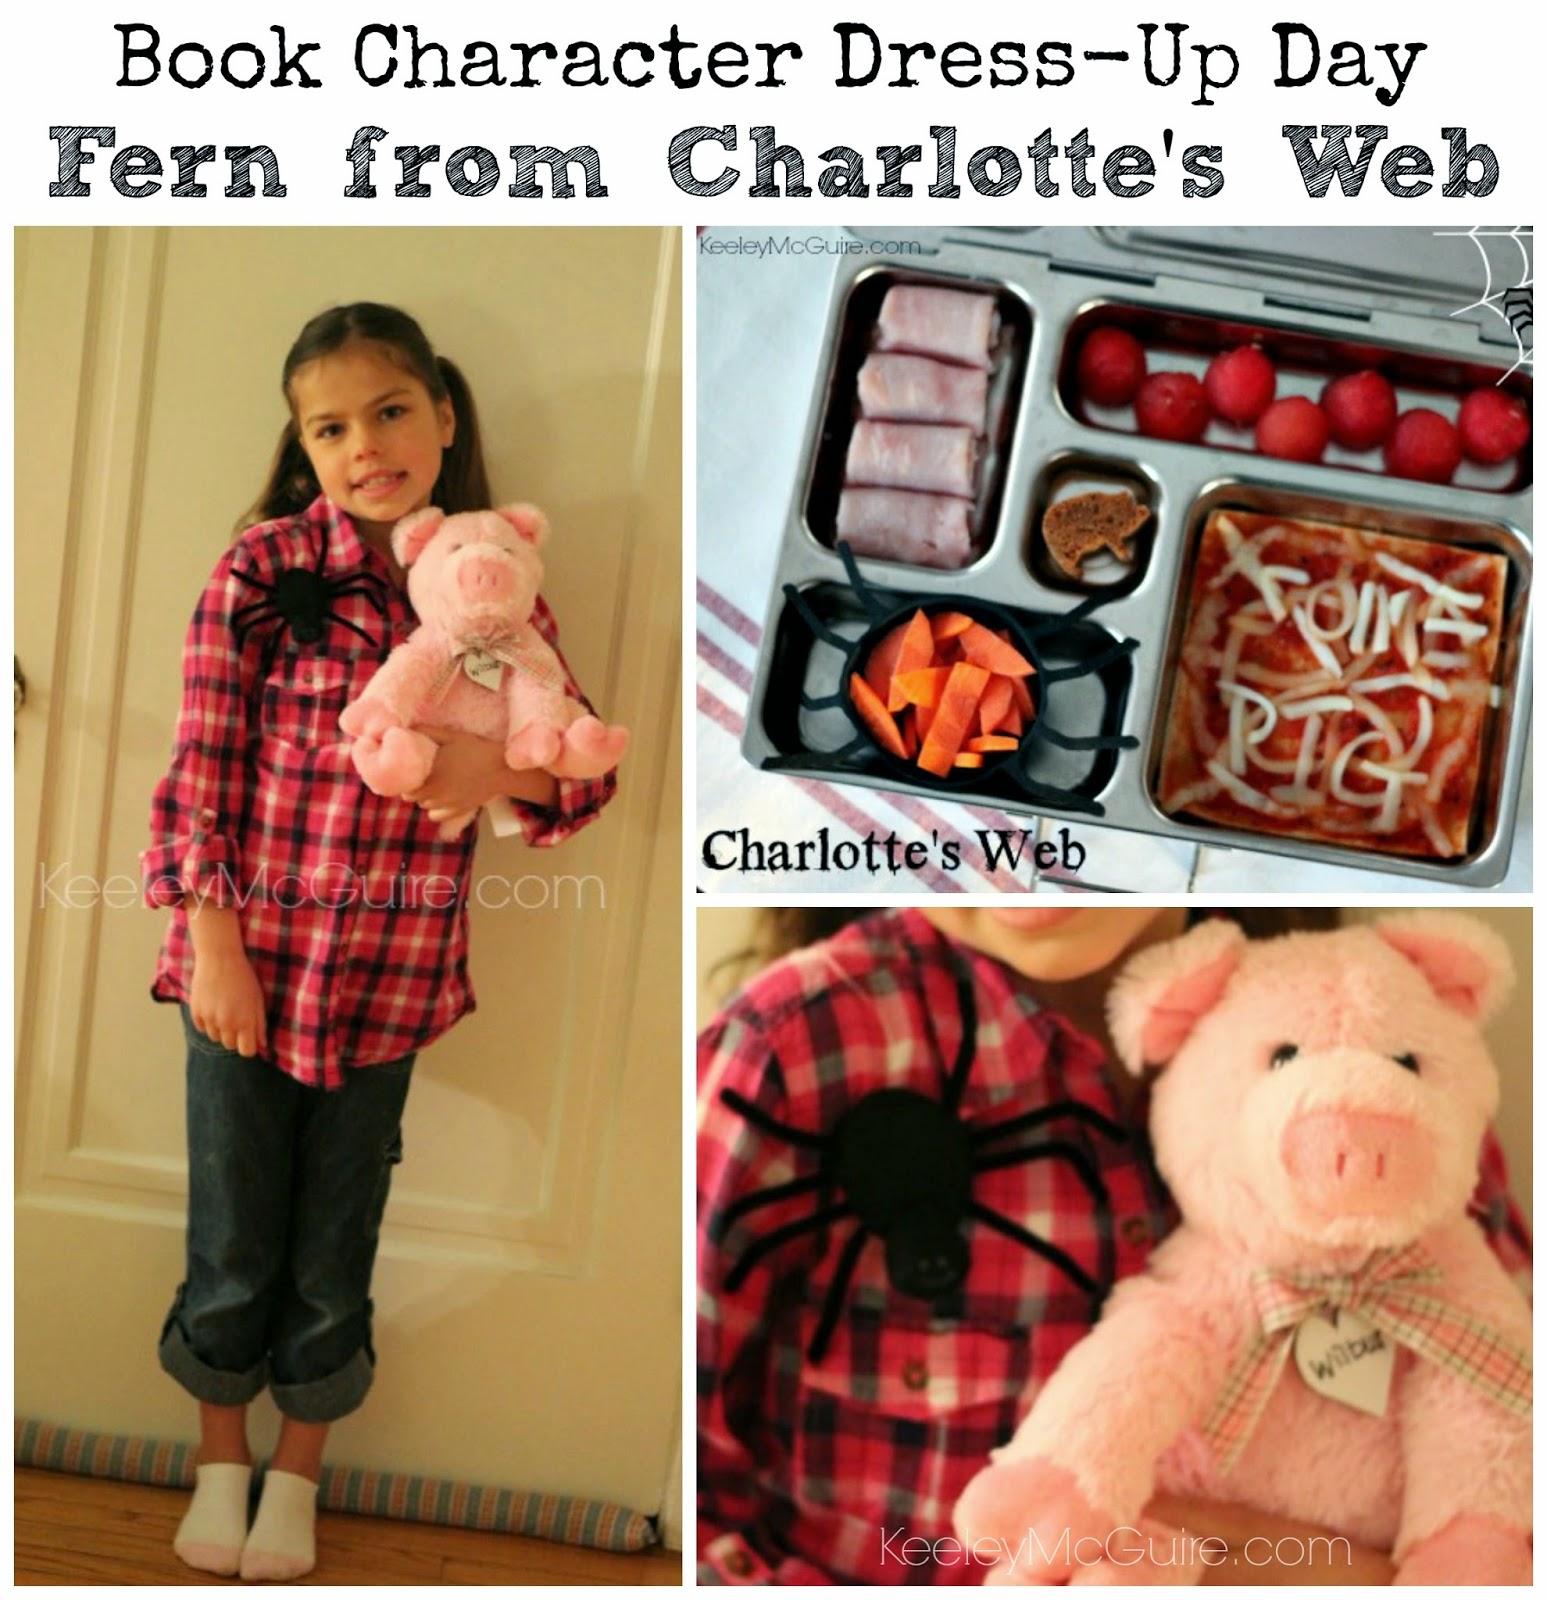 Gluten free amp allergy friendly charlotte s web book character dress